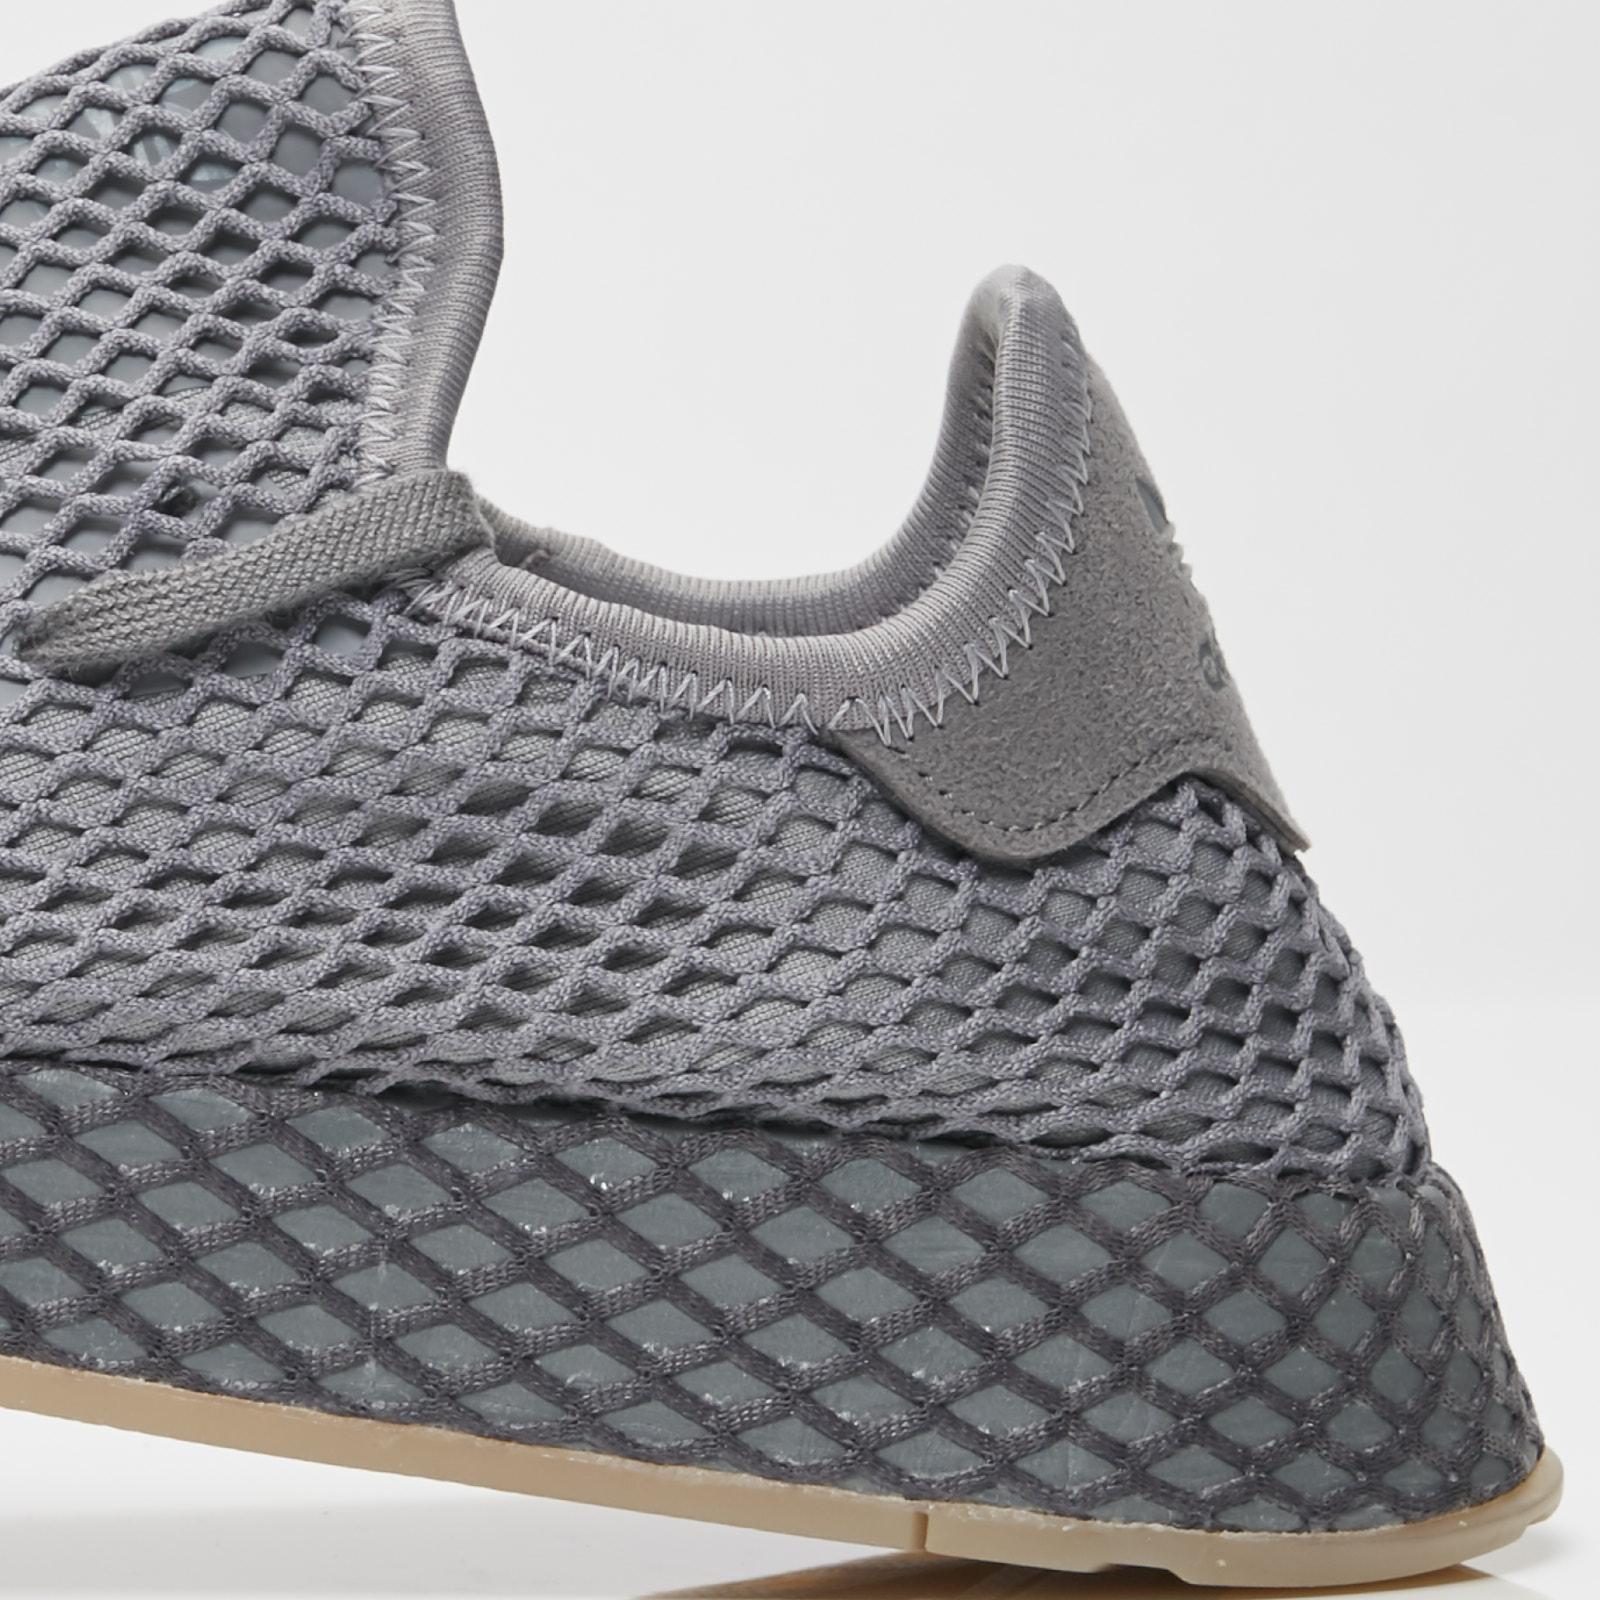 low priced 9a662 952ac ... adidas Originals Deerupt Runner